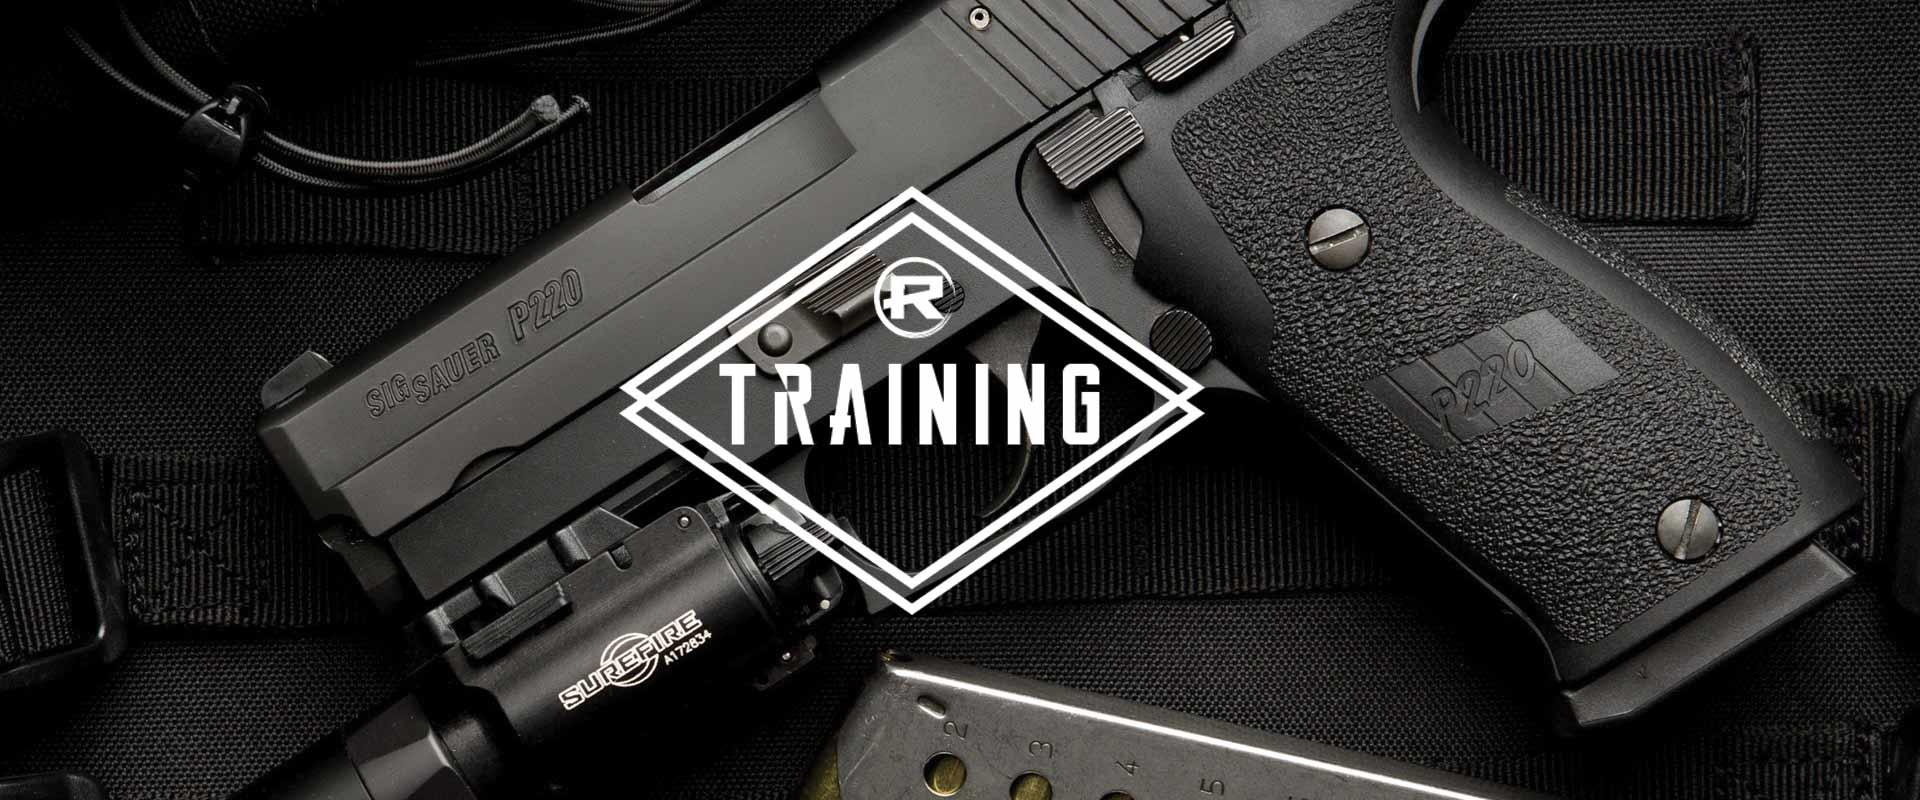 training_slider